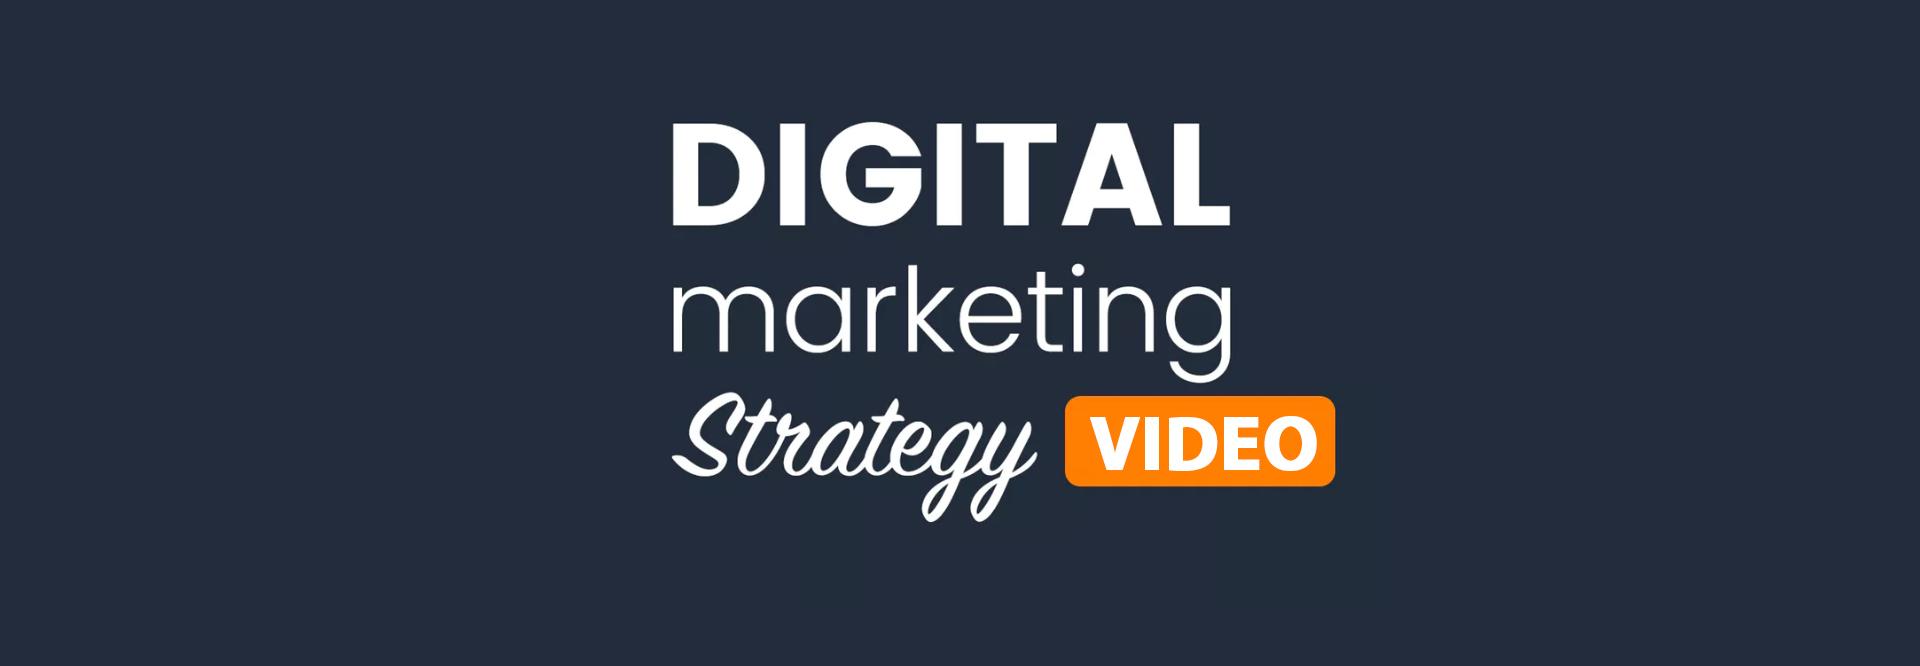 Estrategia de comunicación videos audiovisuales para planes de comunicacion grupoaudiovisual 01